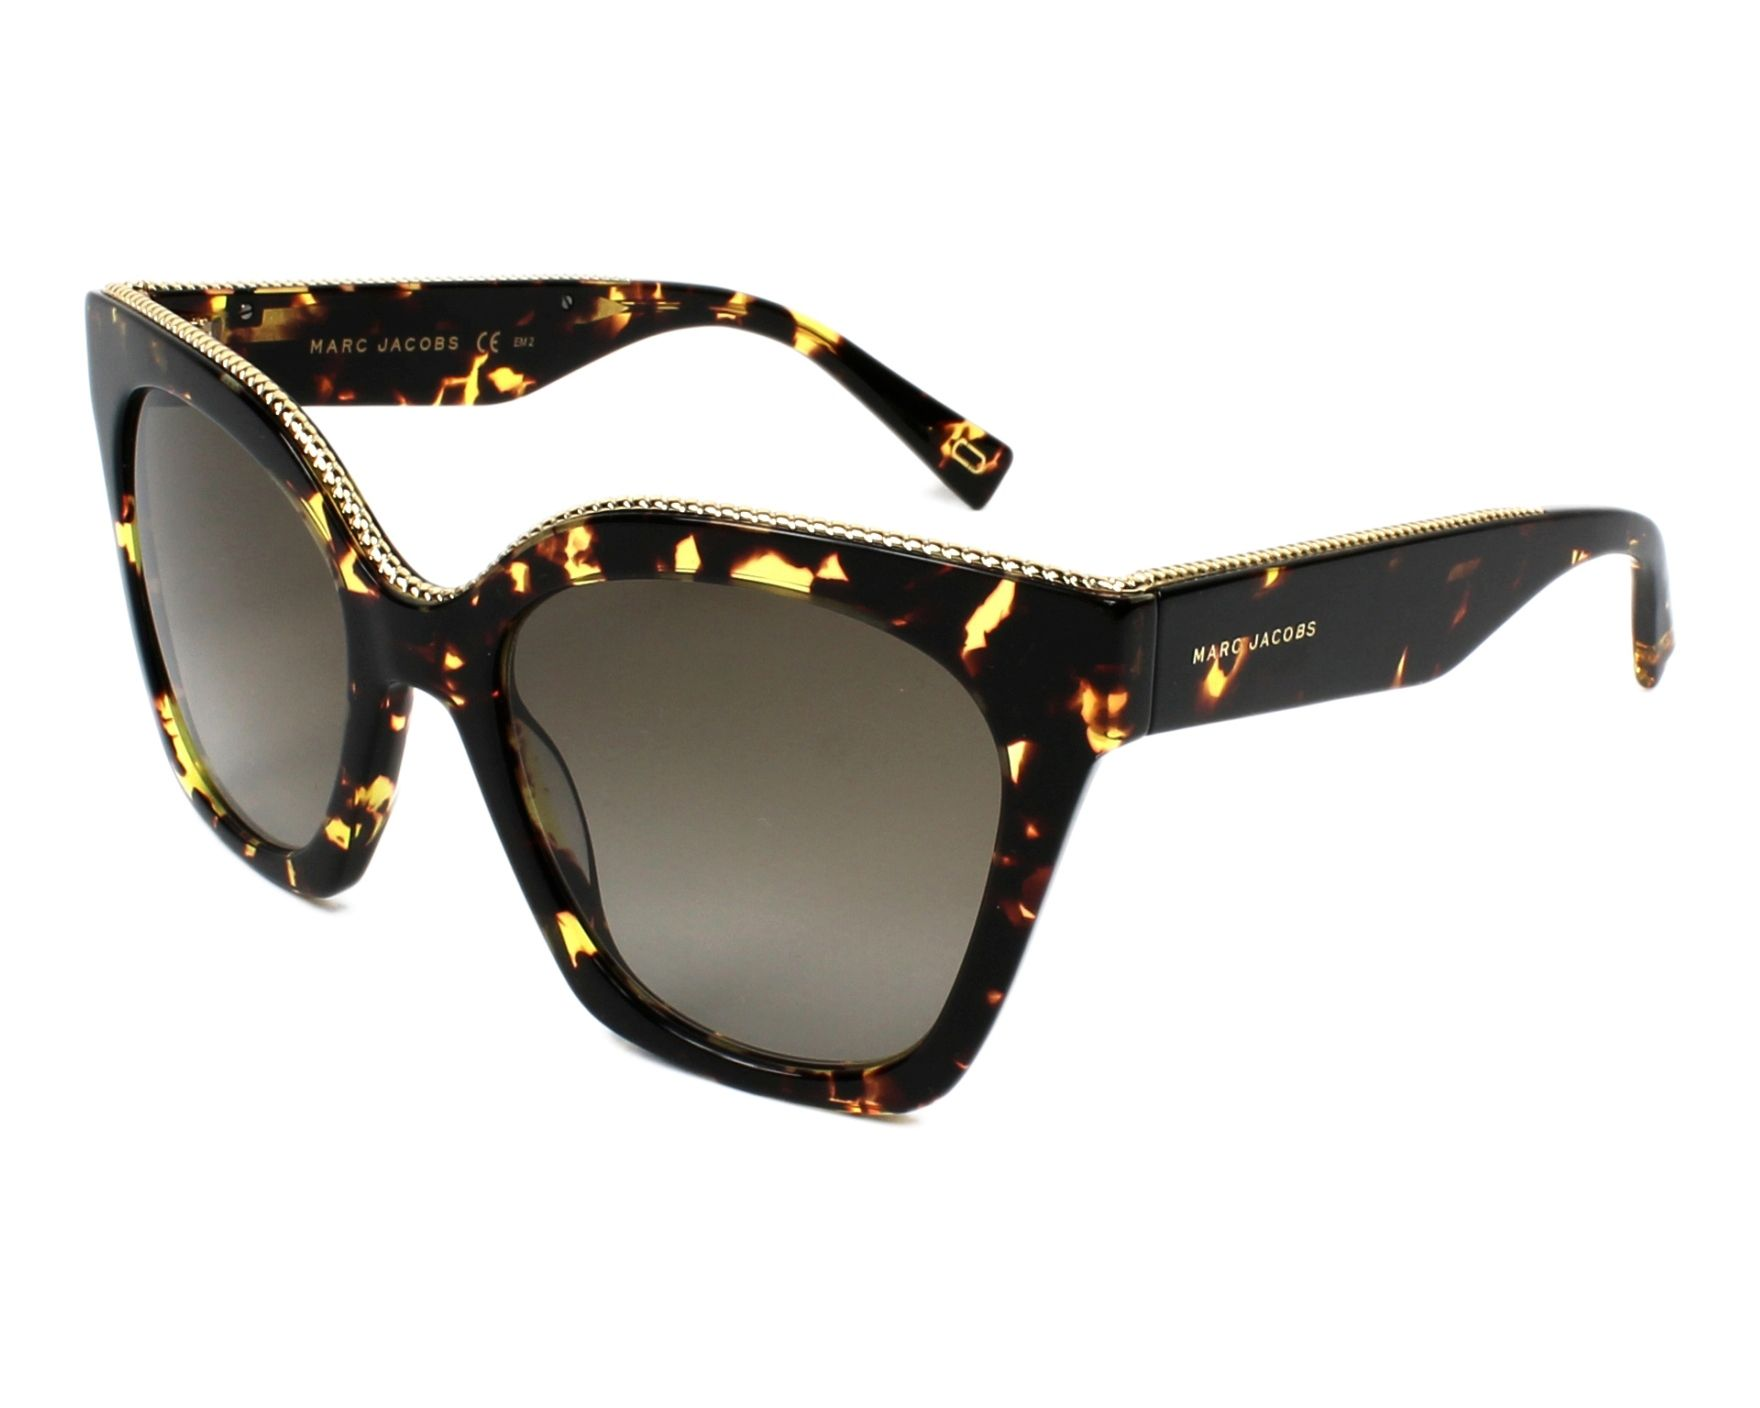 6a1141530c Sunglasses Marc Jacobs MARC-162-S 086/HA 52-19 Havana Gold